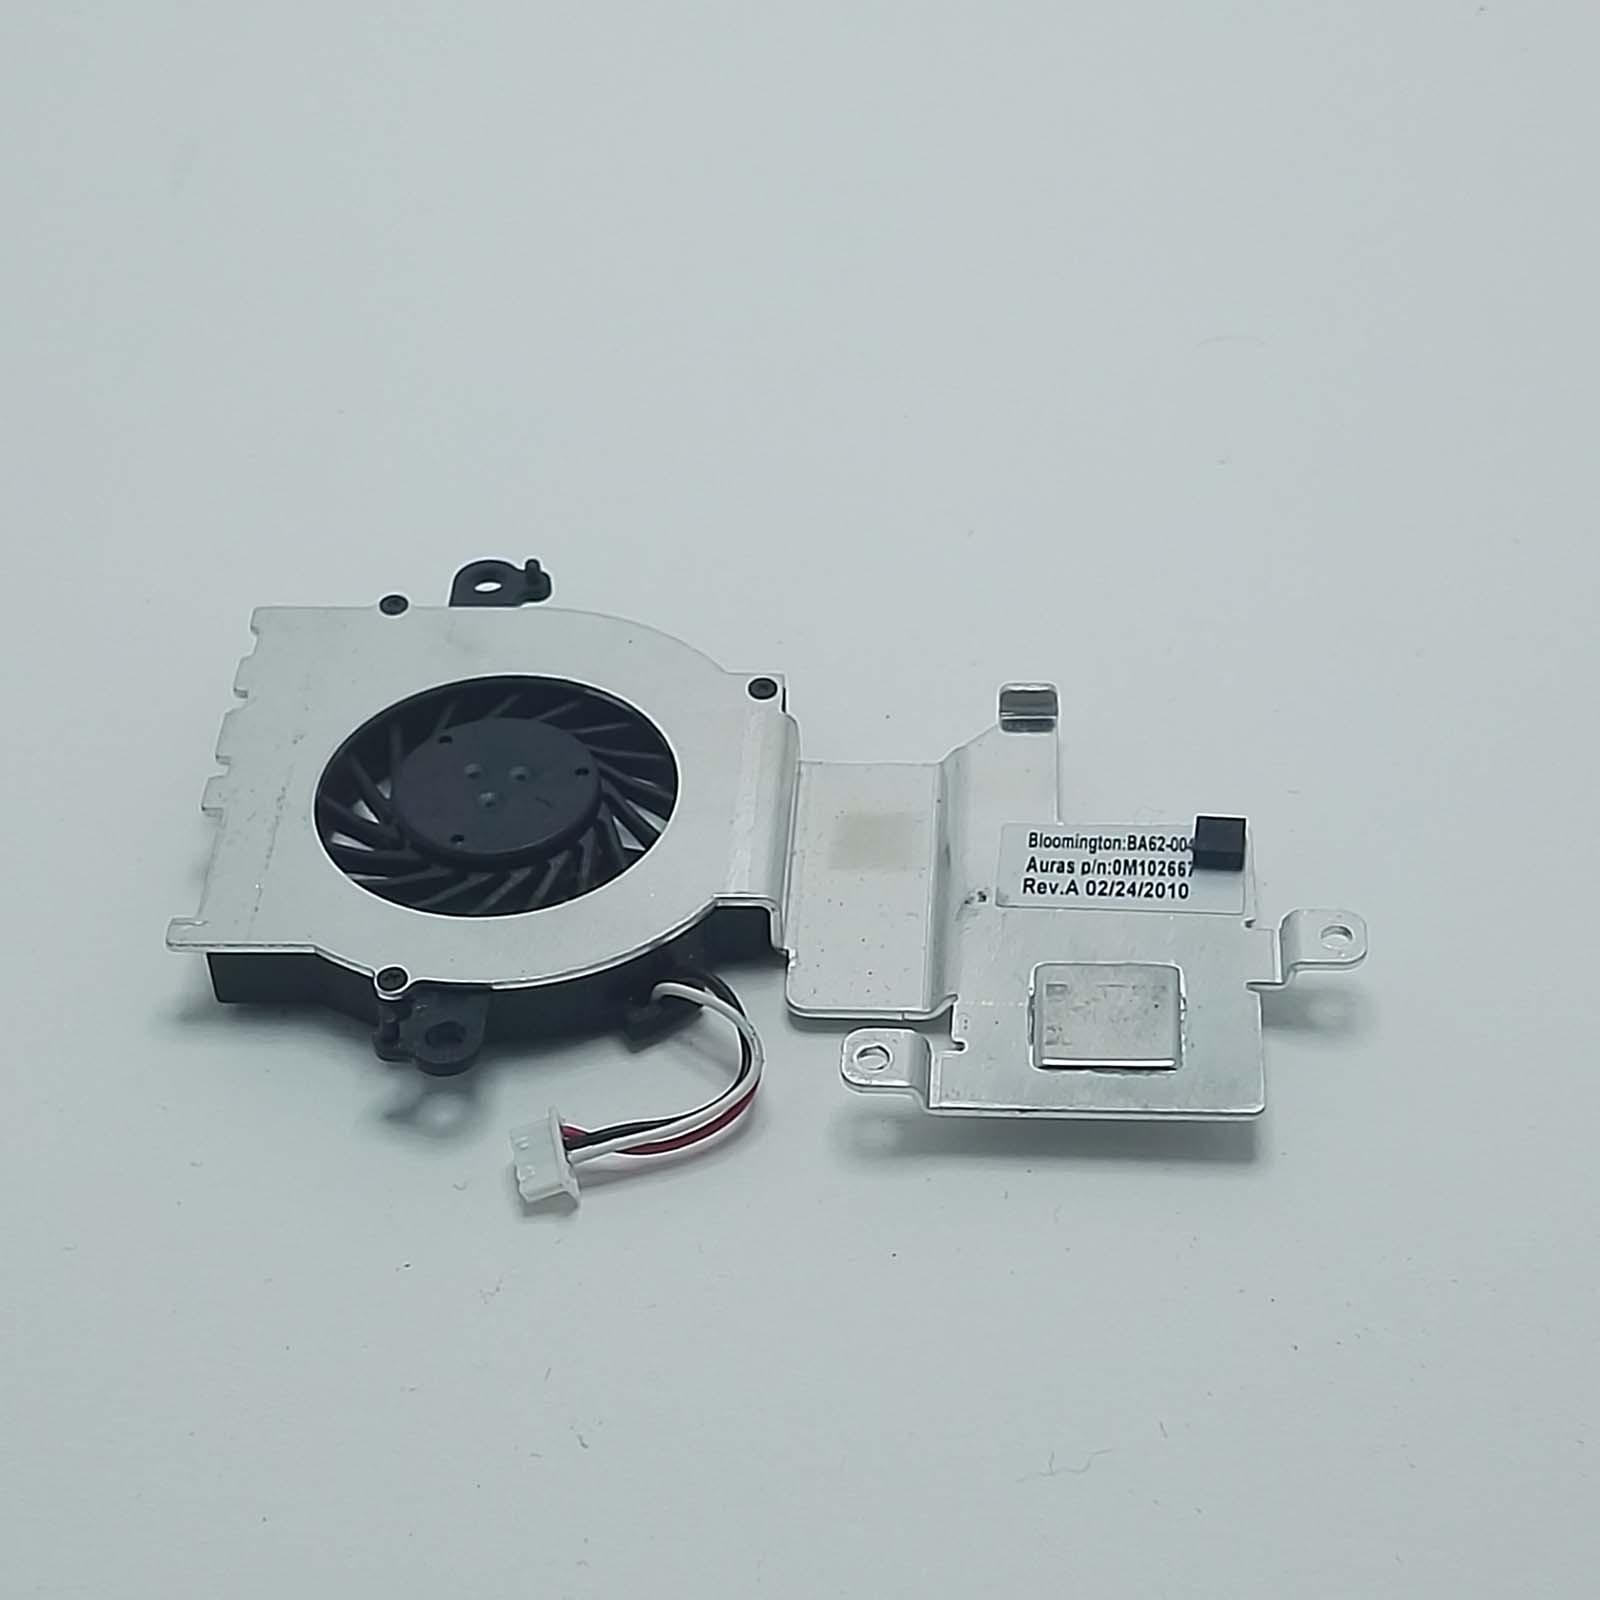 Dissipatore originale con ventola FAN Samsung N150 NP-N150 BA62-00495A